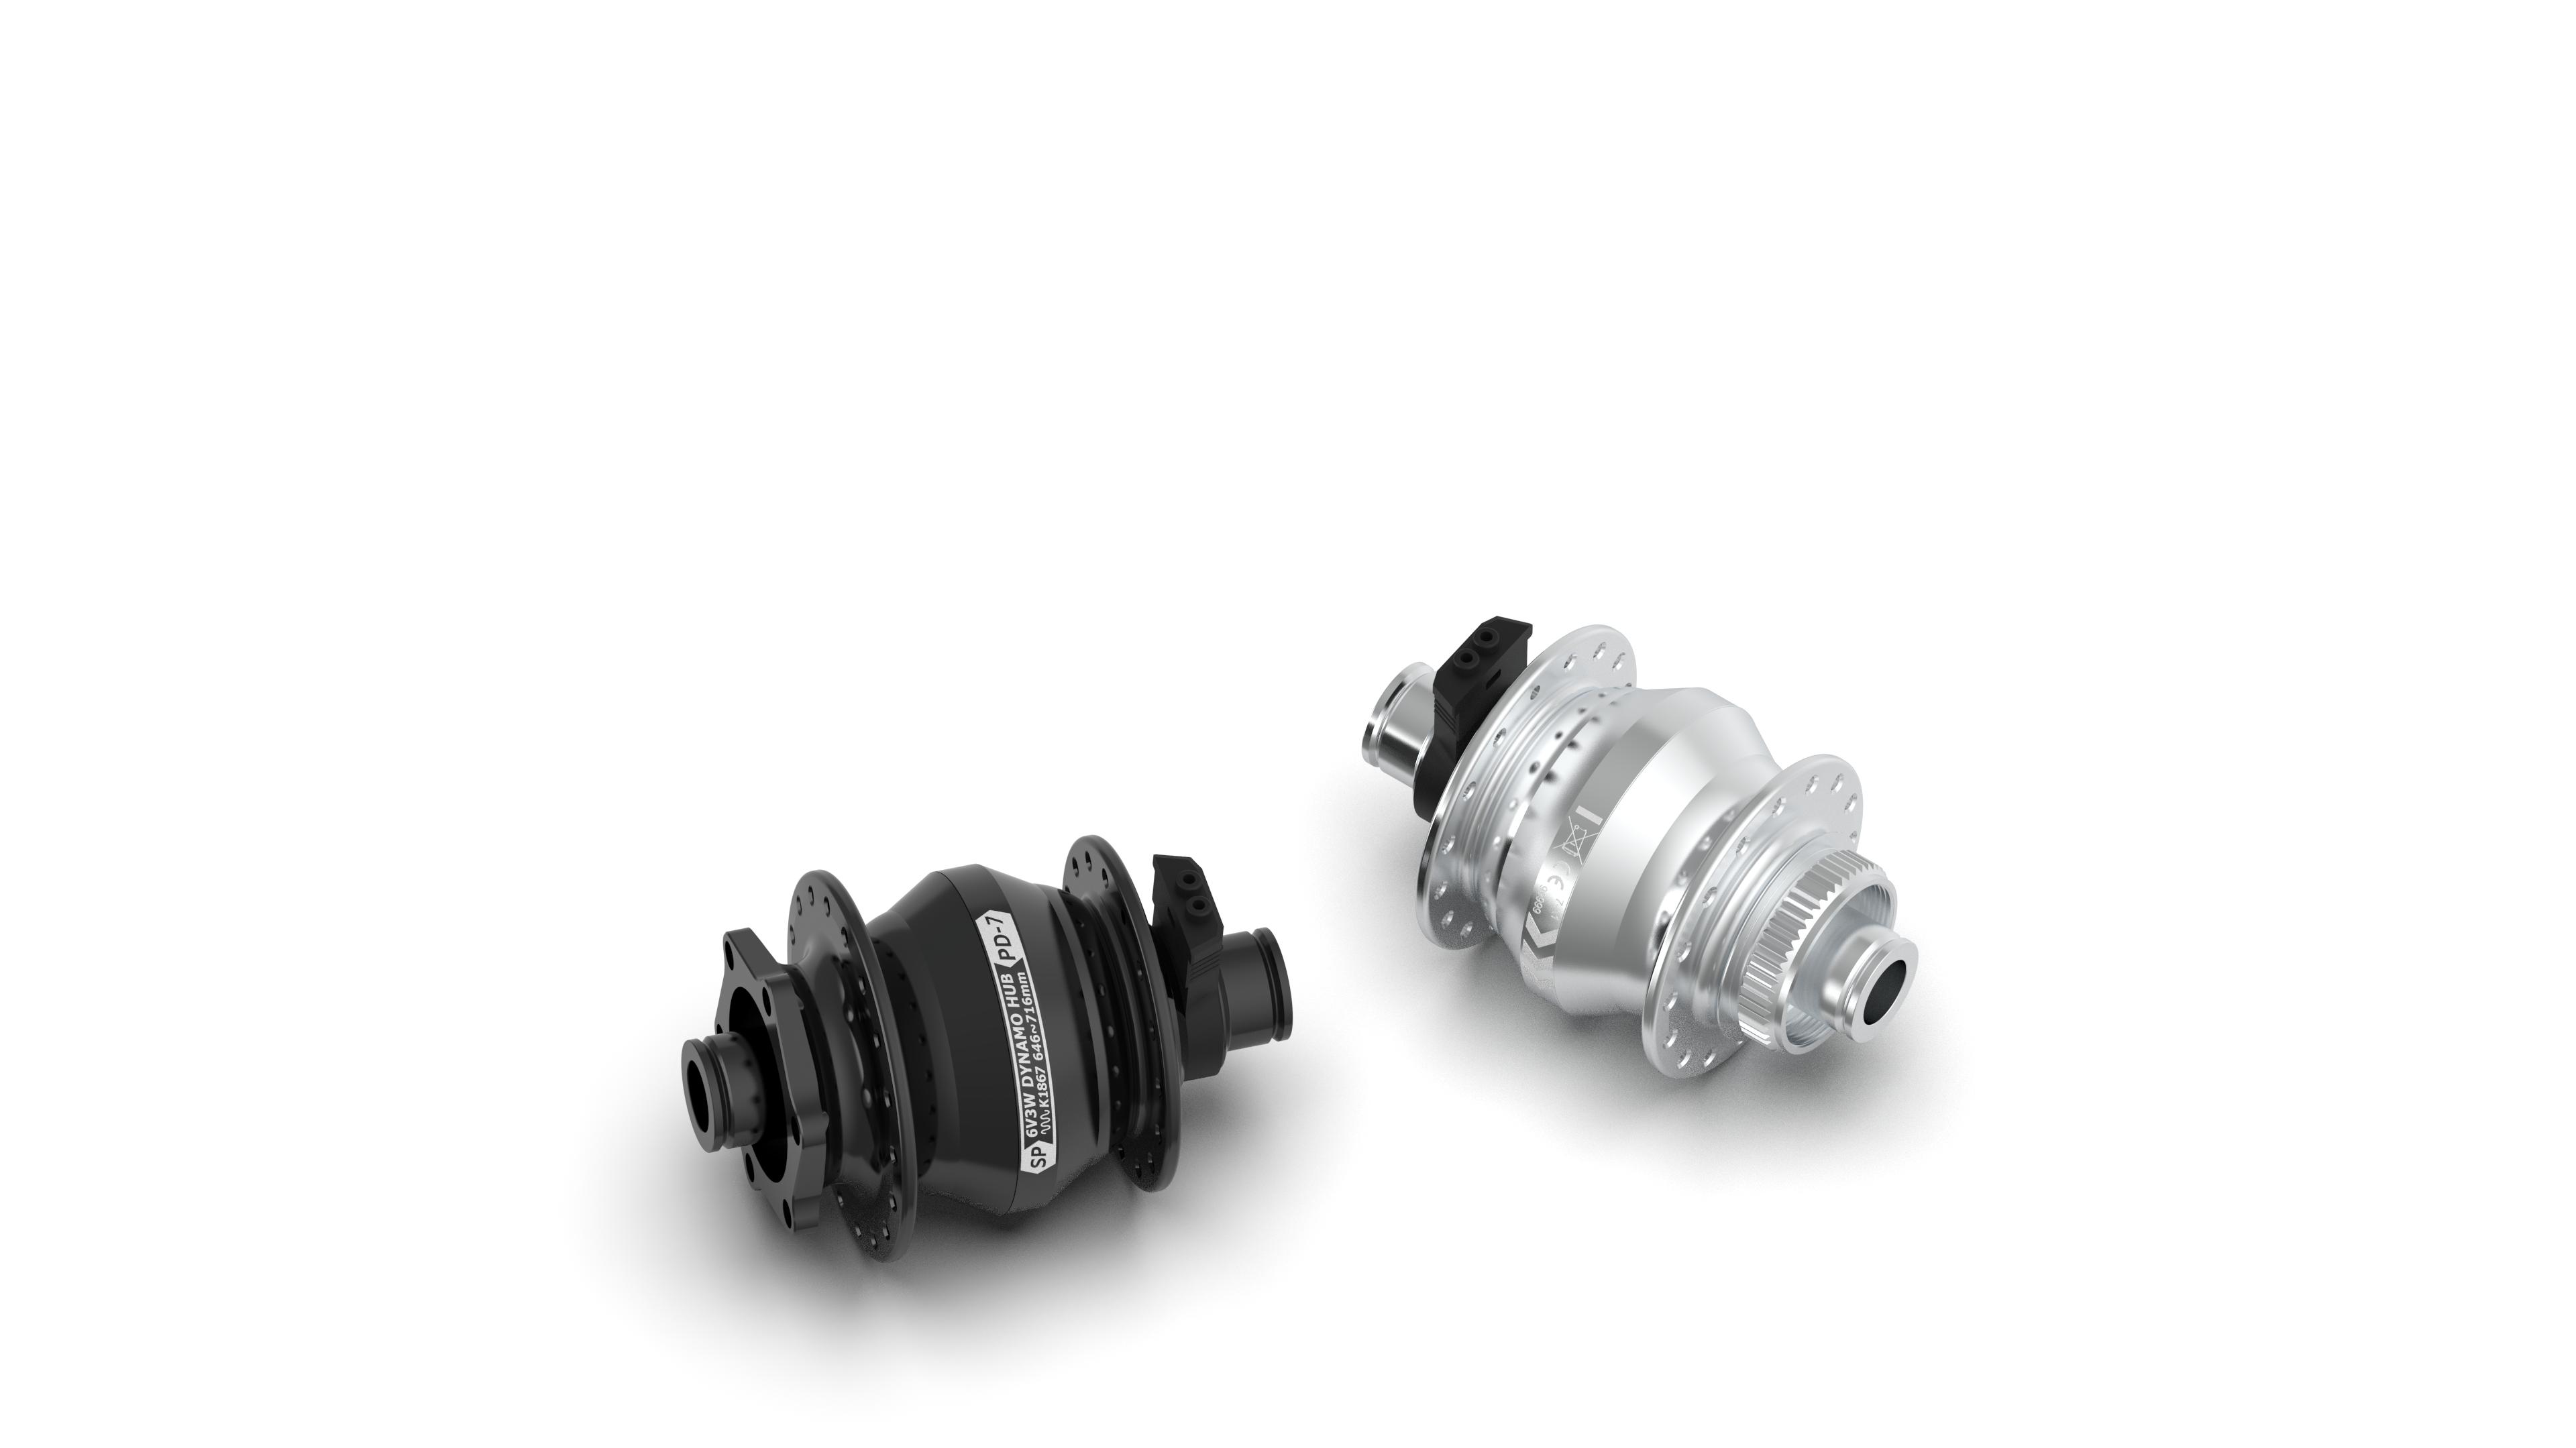 hub dynamo SP PL-7 Centerlock QR12 dynohub Shutter Precision